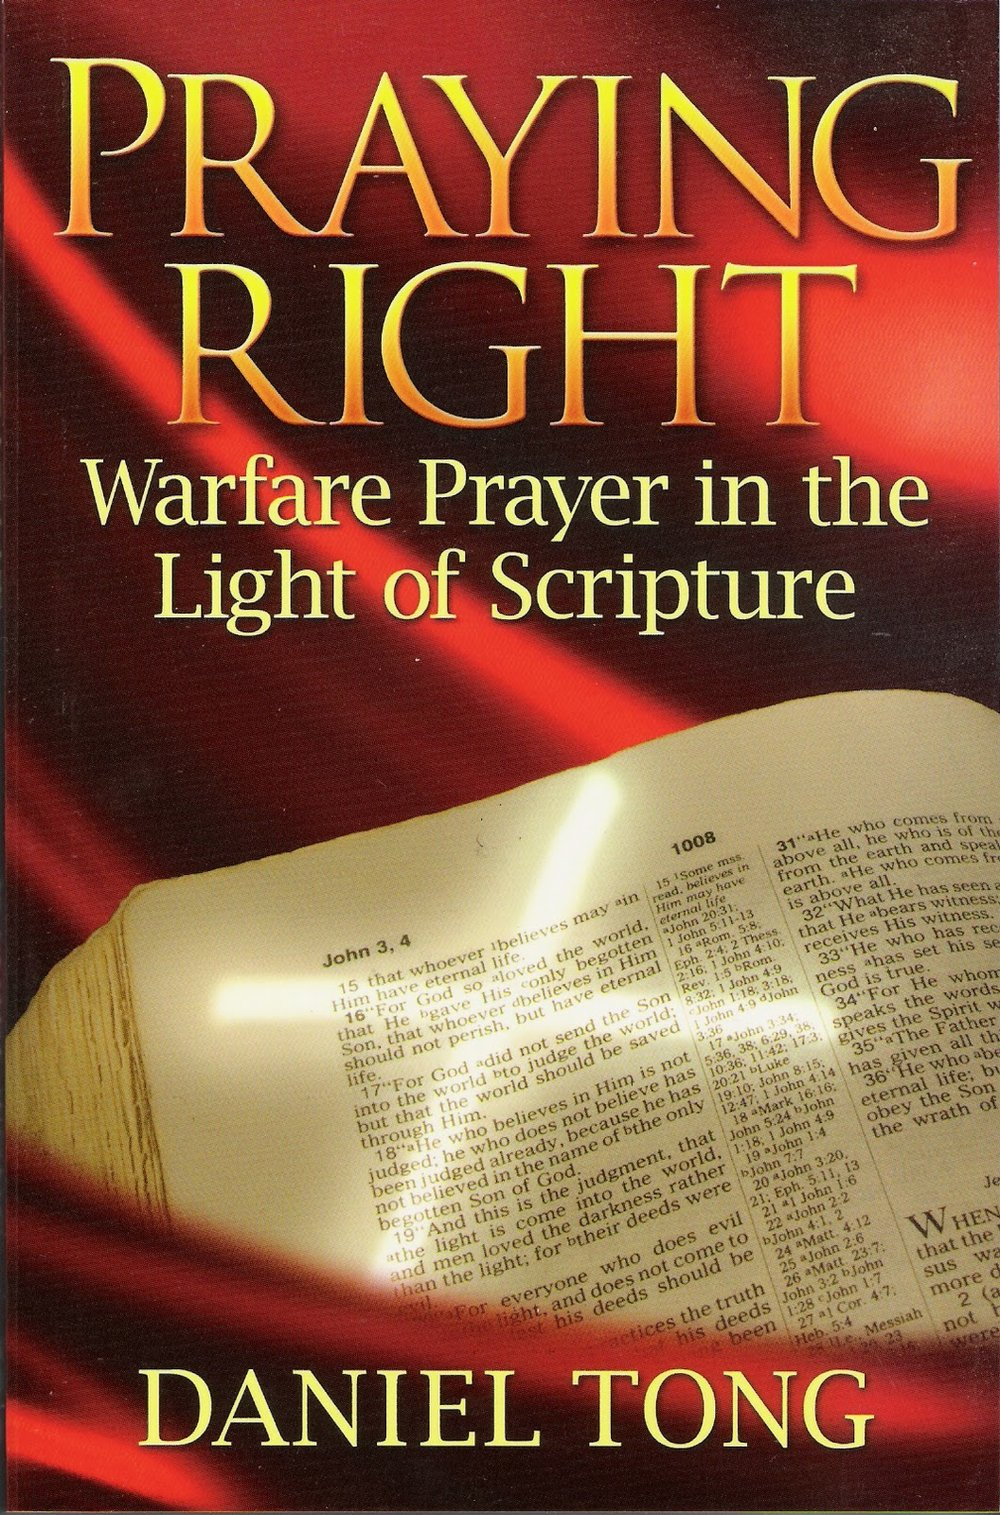 Praying Right.jpg